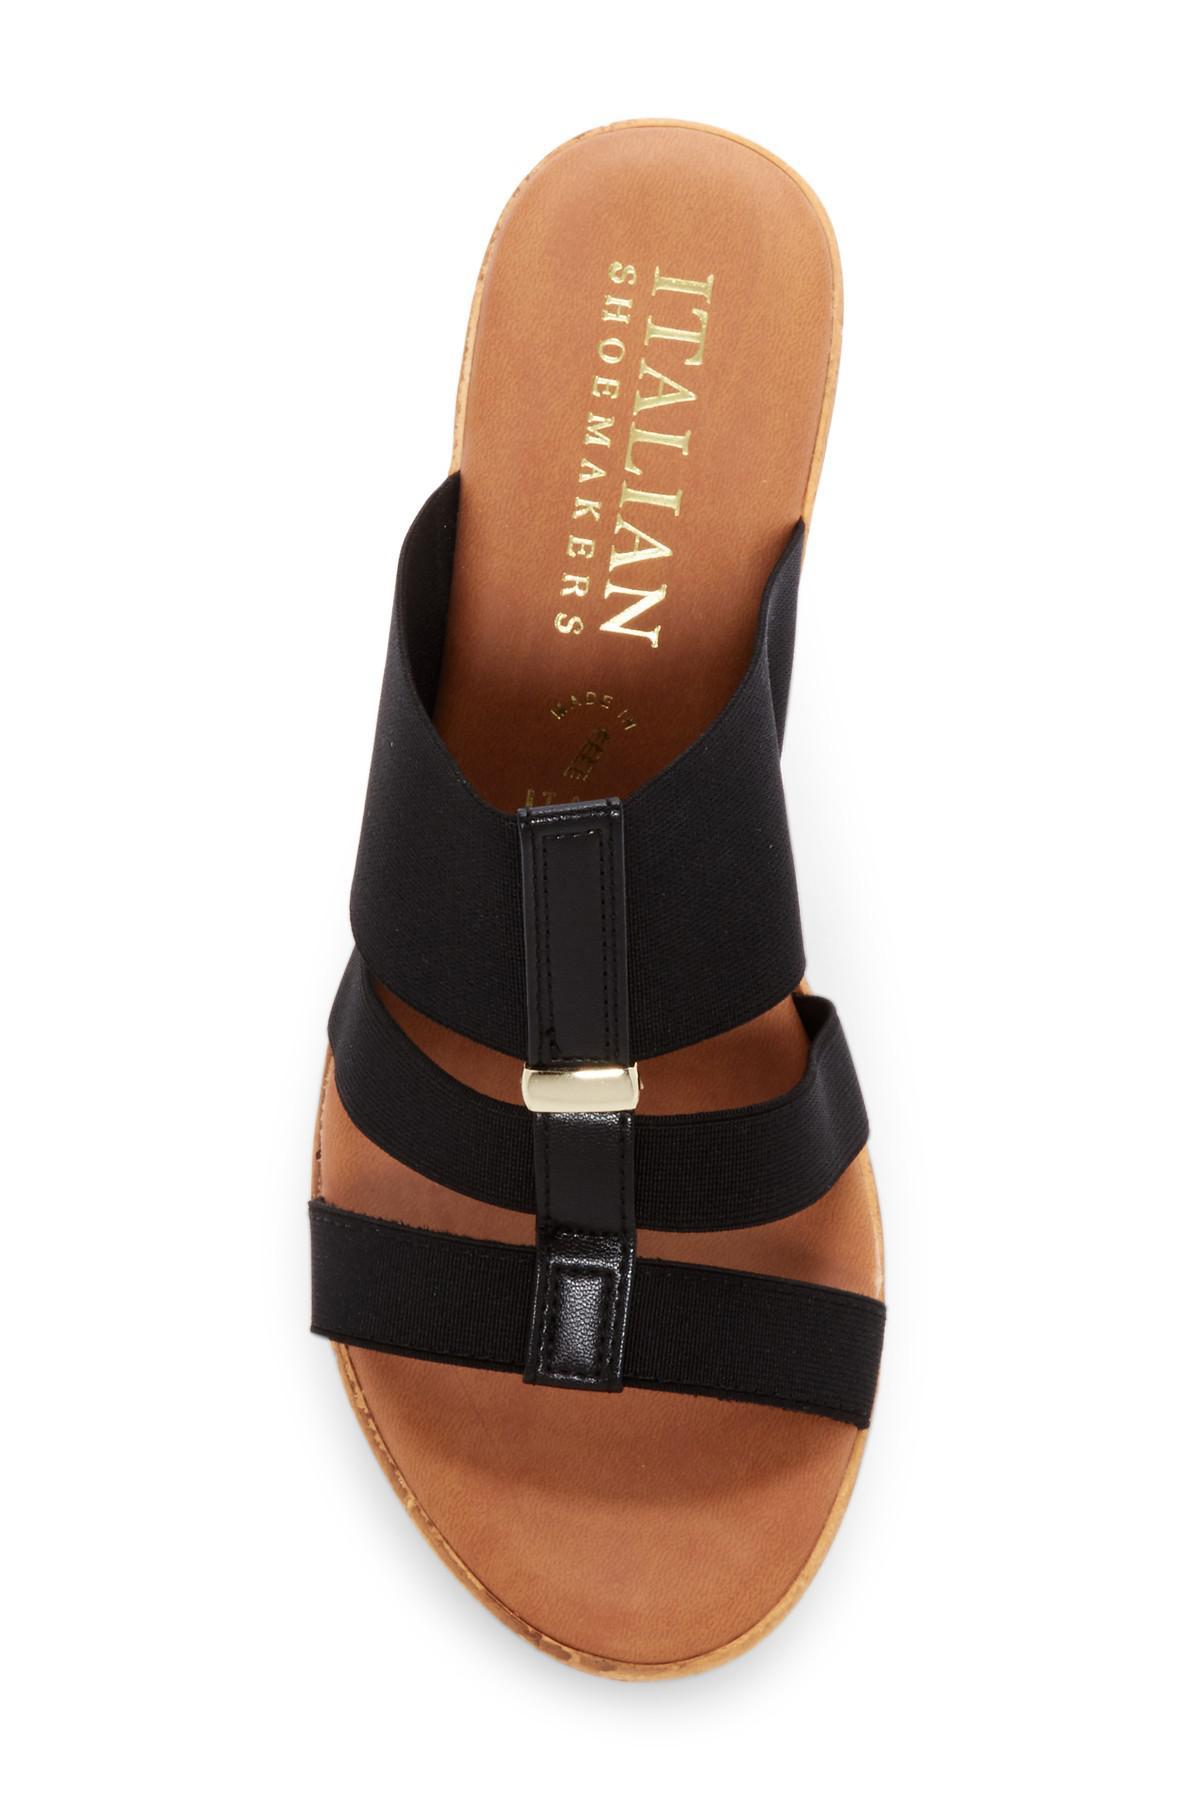 f29fc6b9f277 Lyst - Italian Shoemakers Elasticized Platform Wedge Sandal in Black